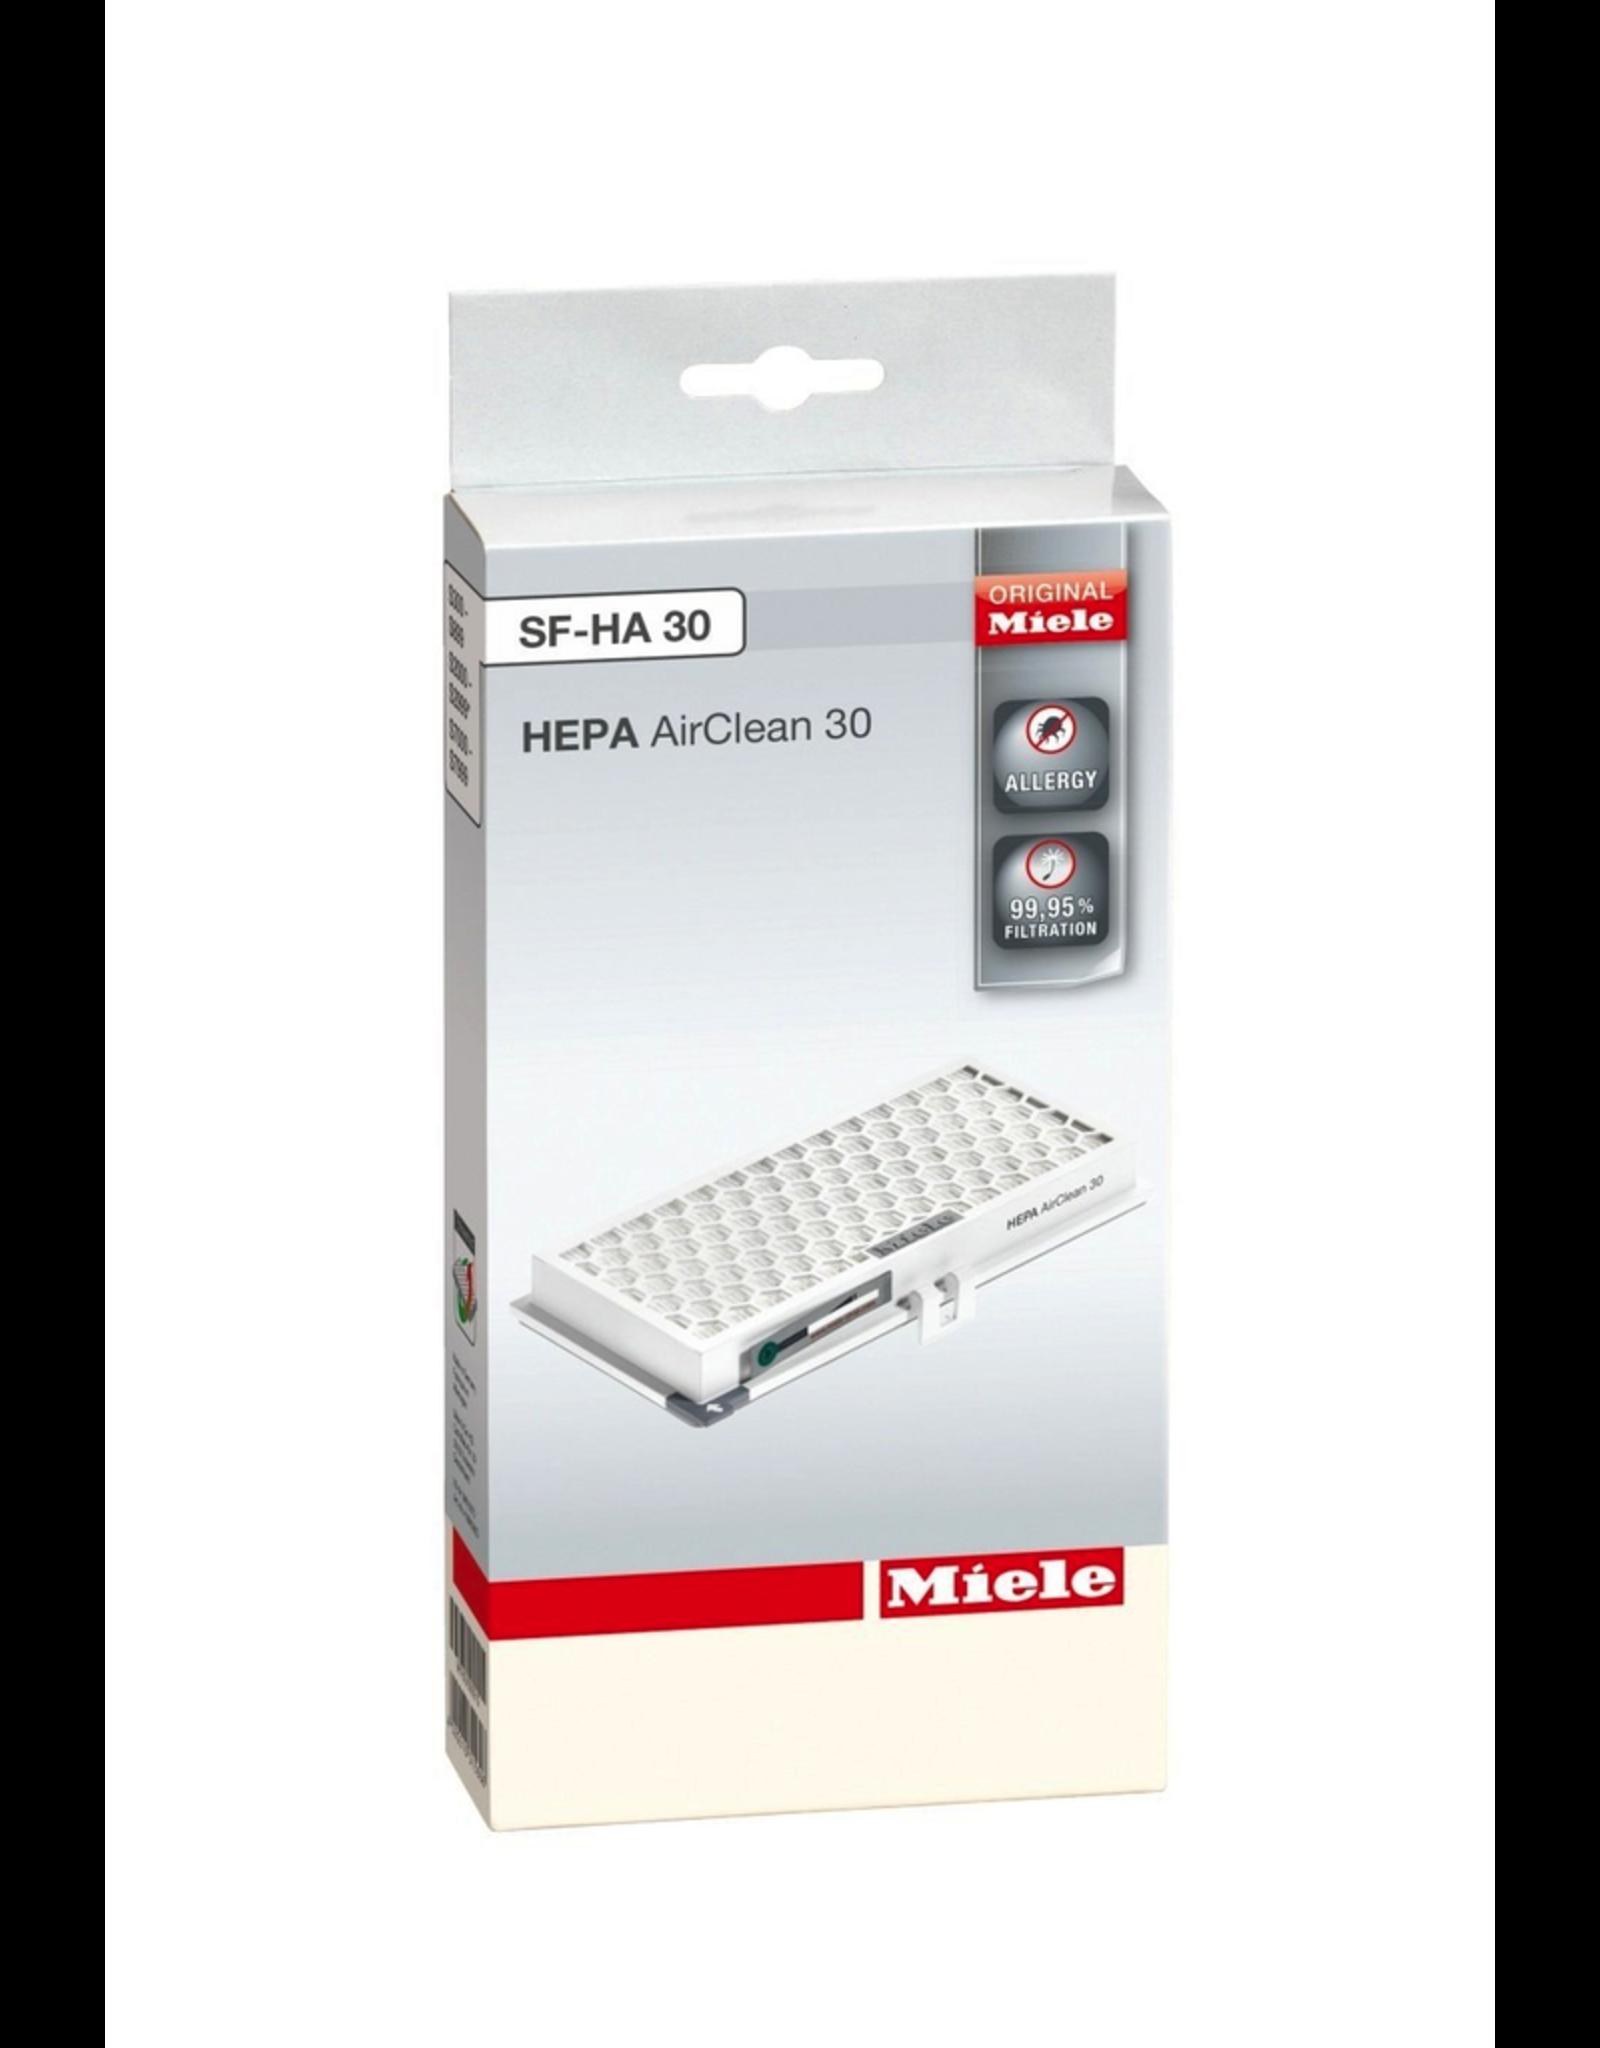 Miele Miele HA-30 HEPA Filter